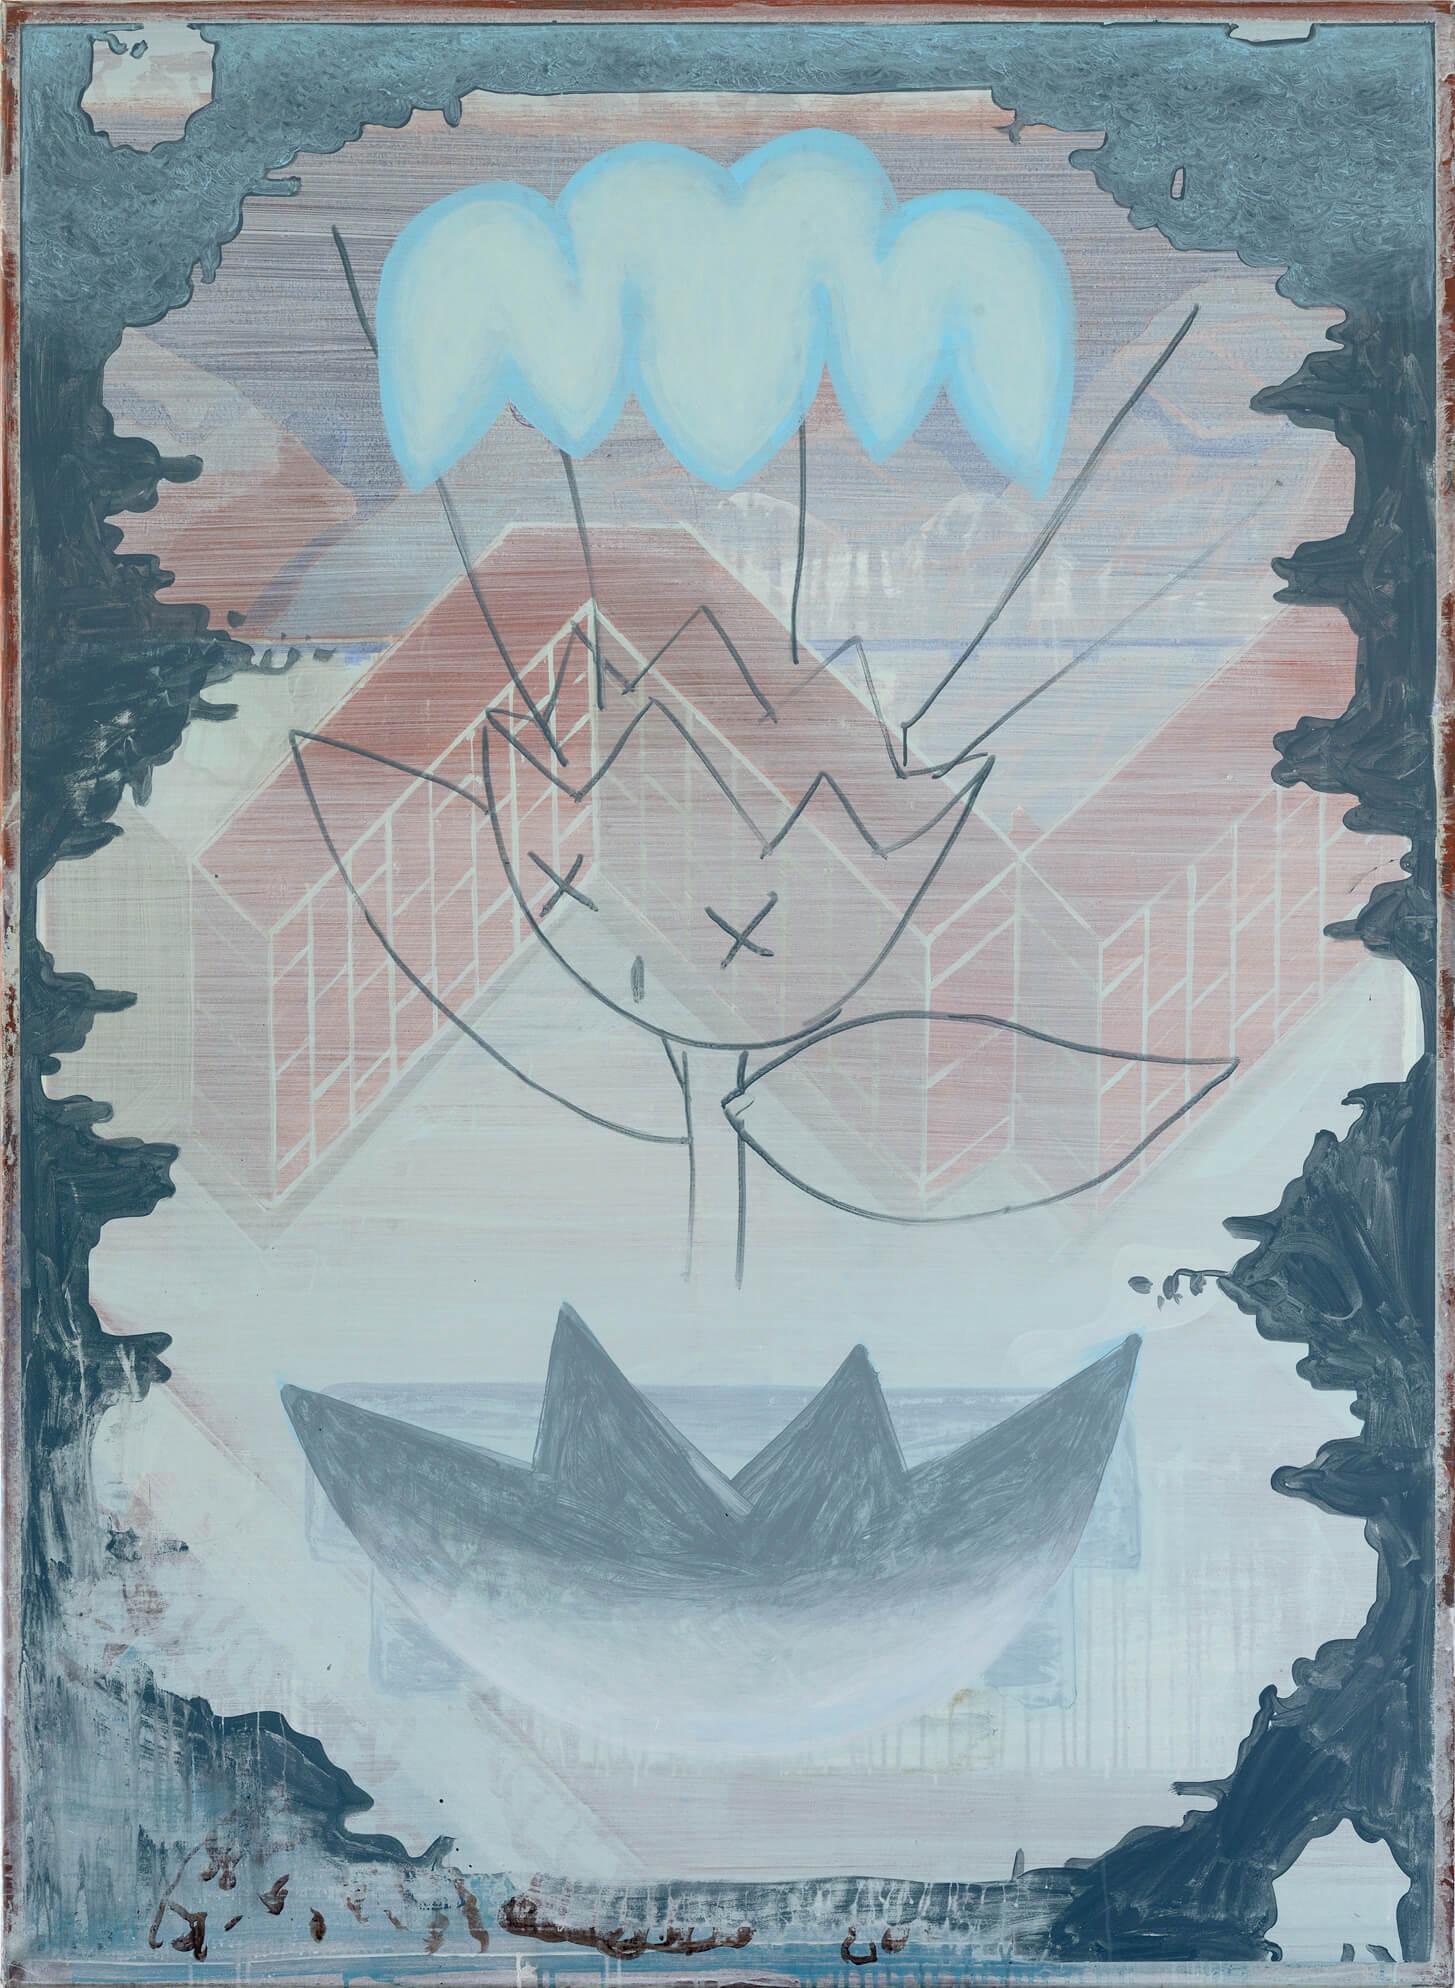 Ludwig Hanisch: Firepot. Acryl auf Baumwolle, 2015 © the artist